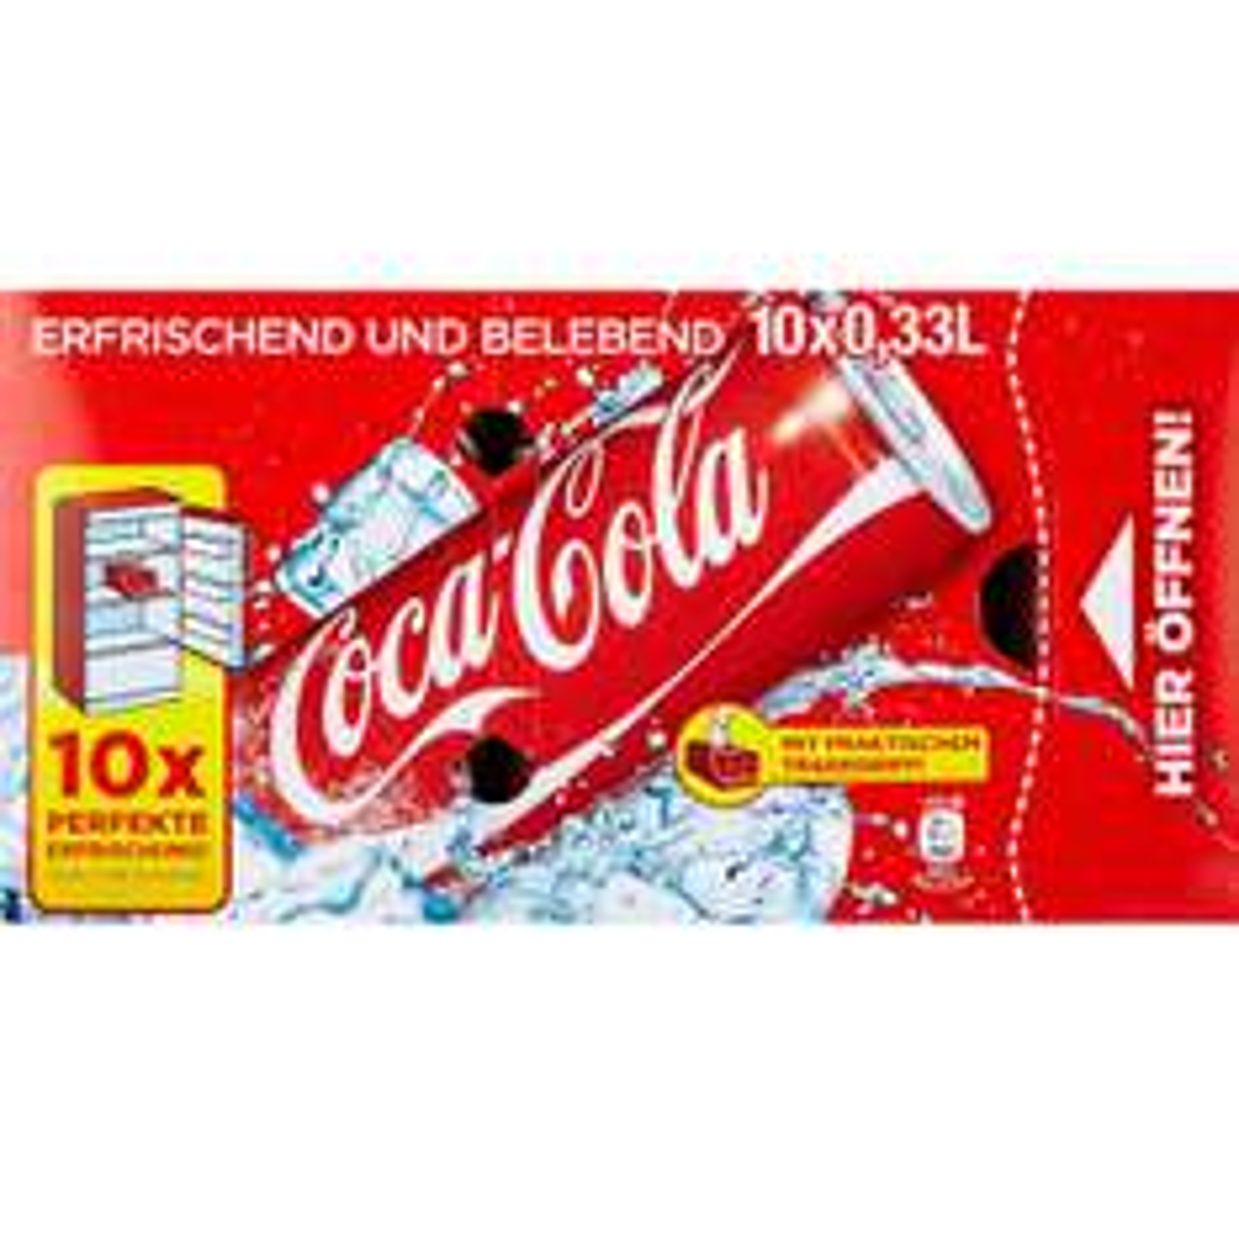 Coca Cola Friendspack 10x 0,33 Liter Bei Rewe 3,99€